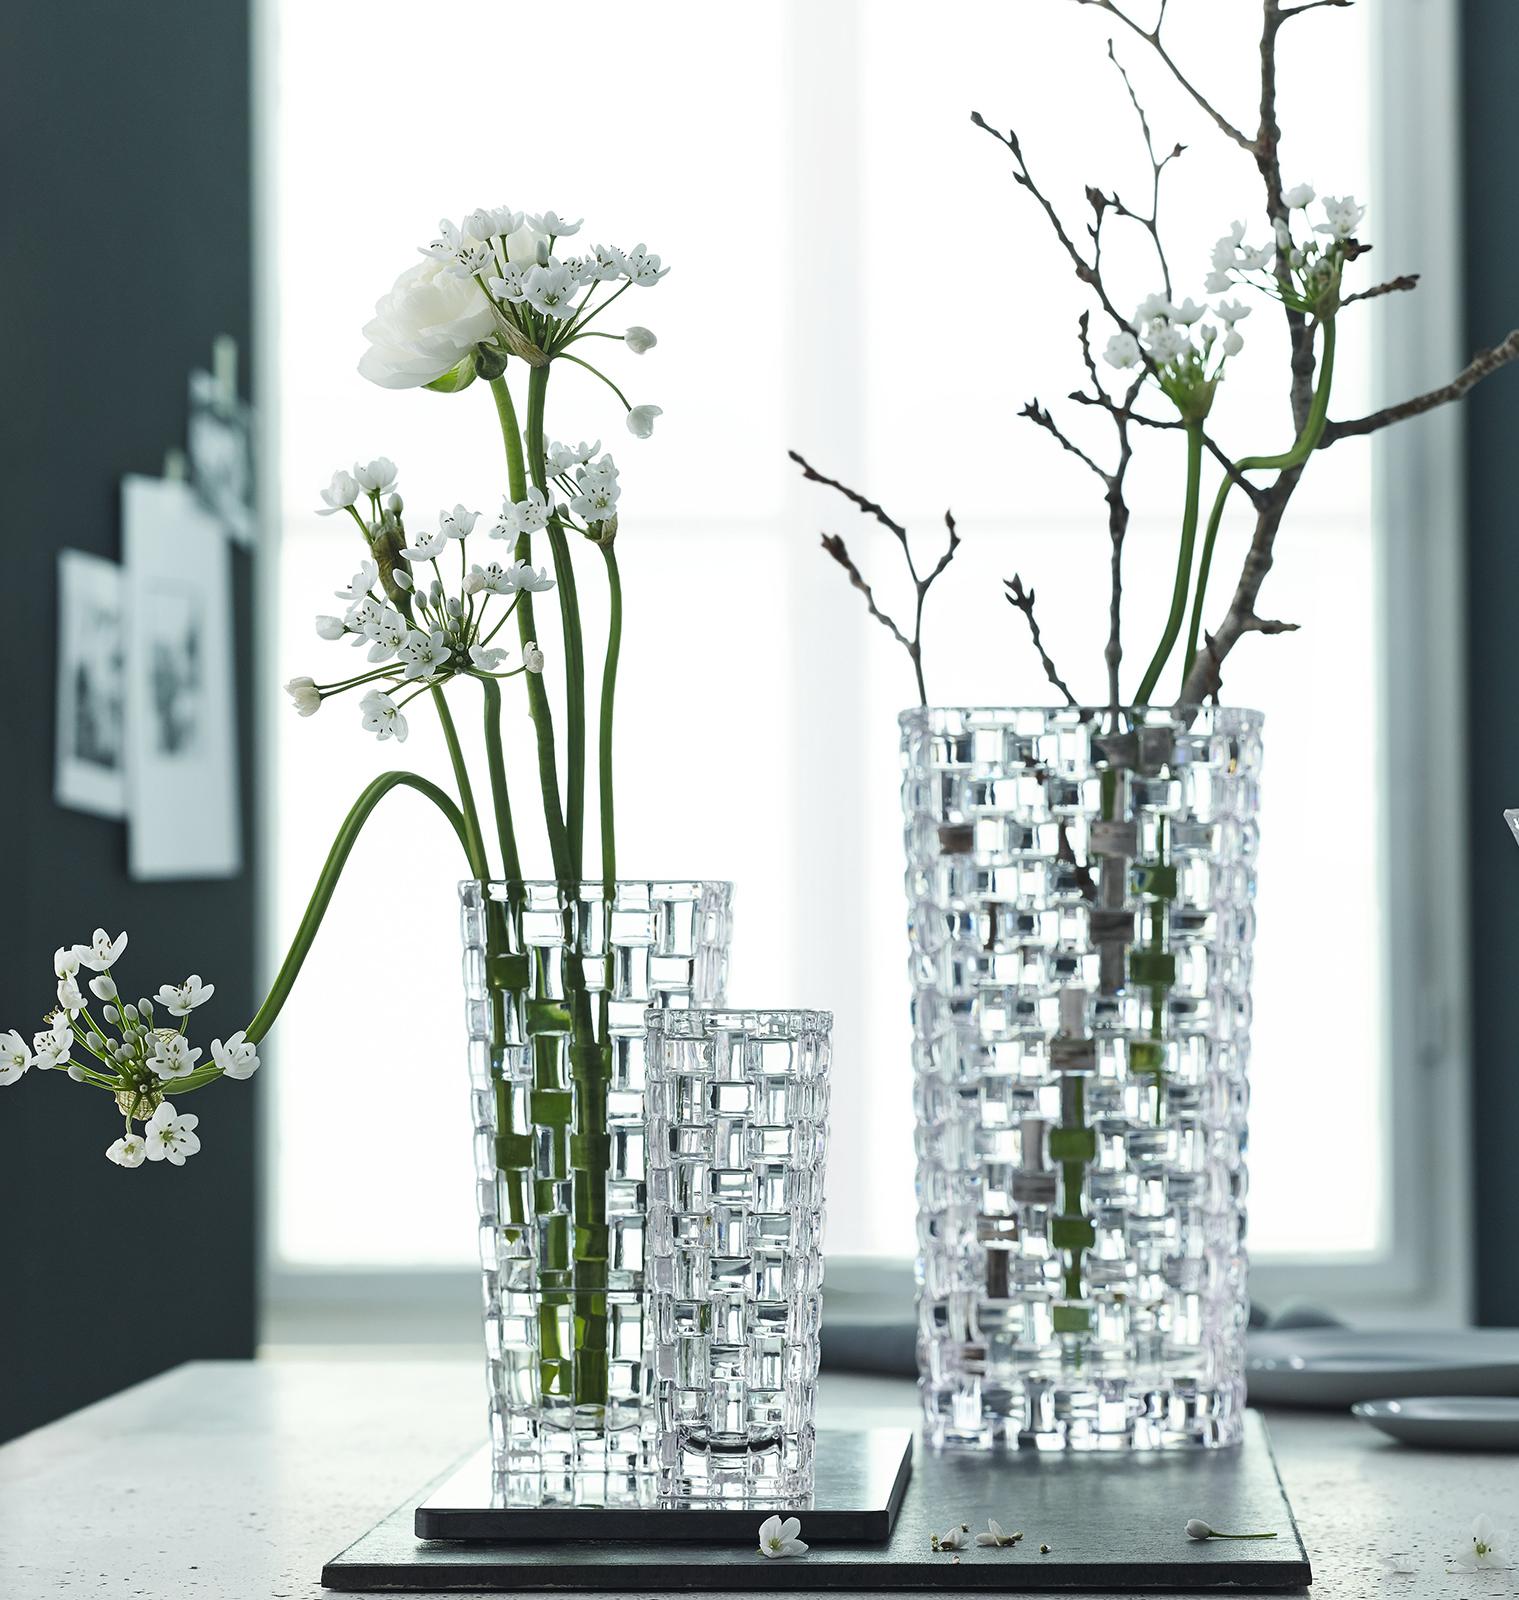 pressemitteilungen apriori pr. Black Bedroom Furniture Sets. Home Design Ideas